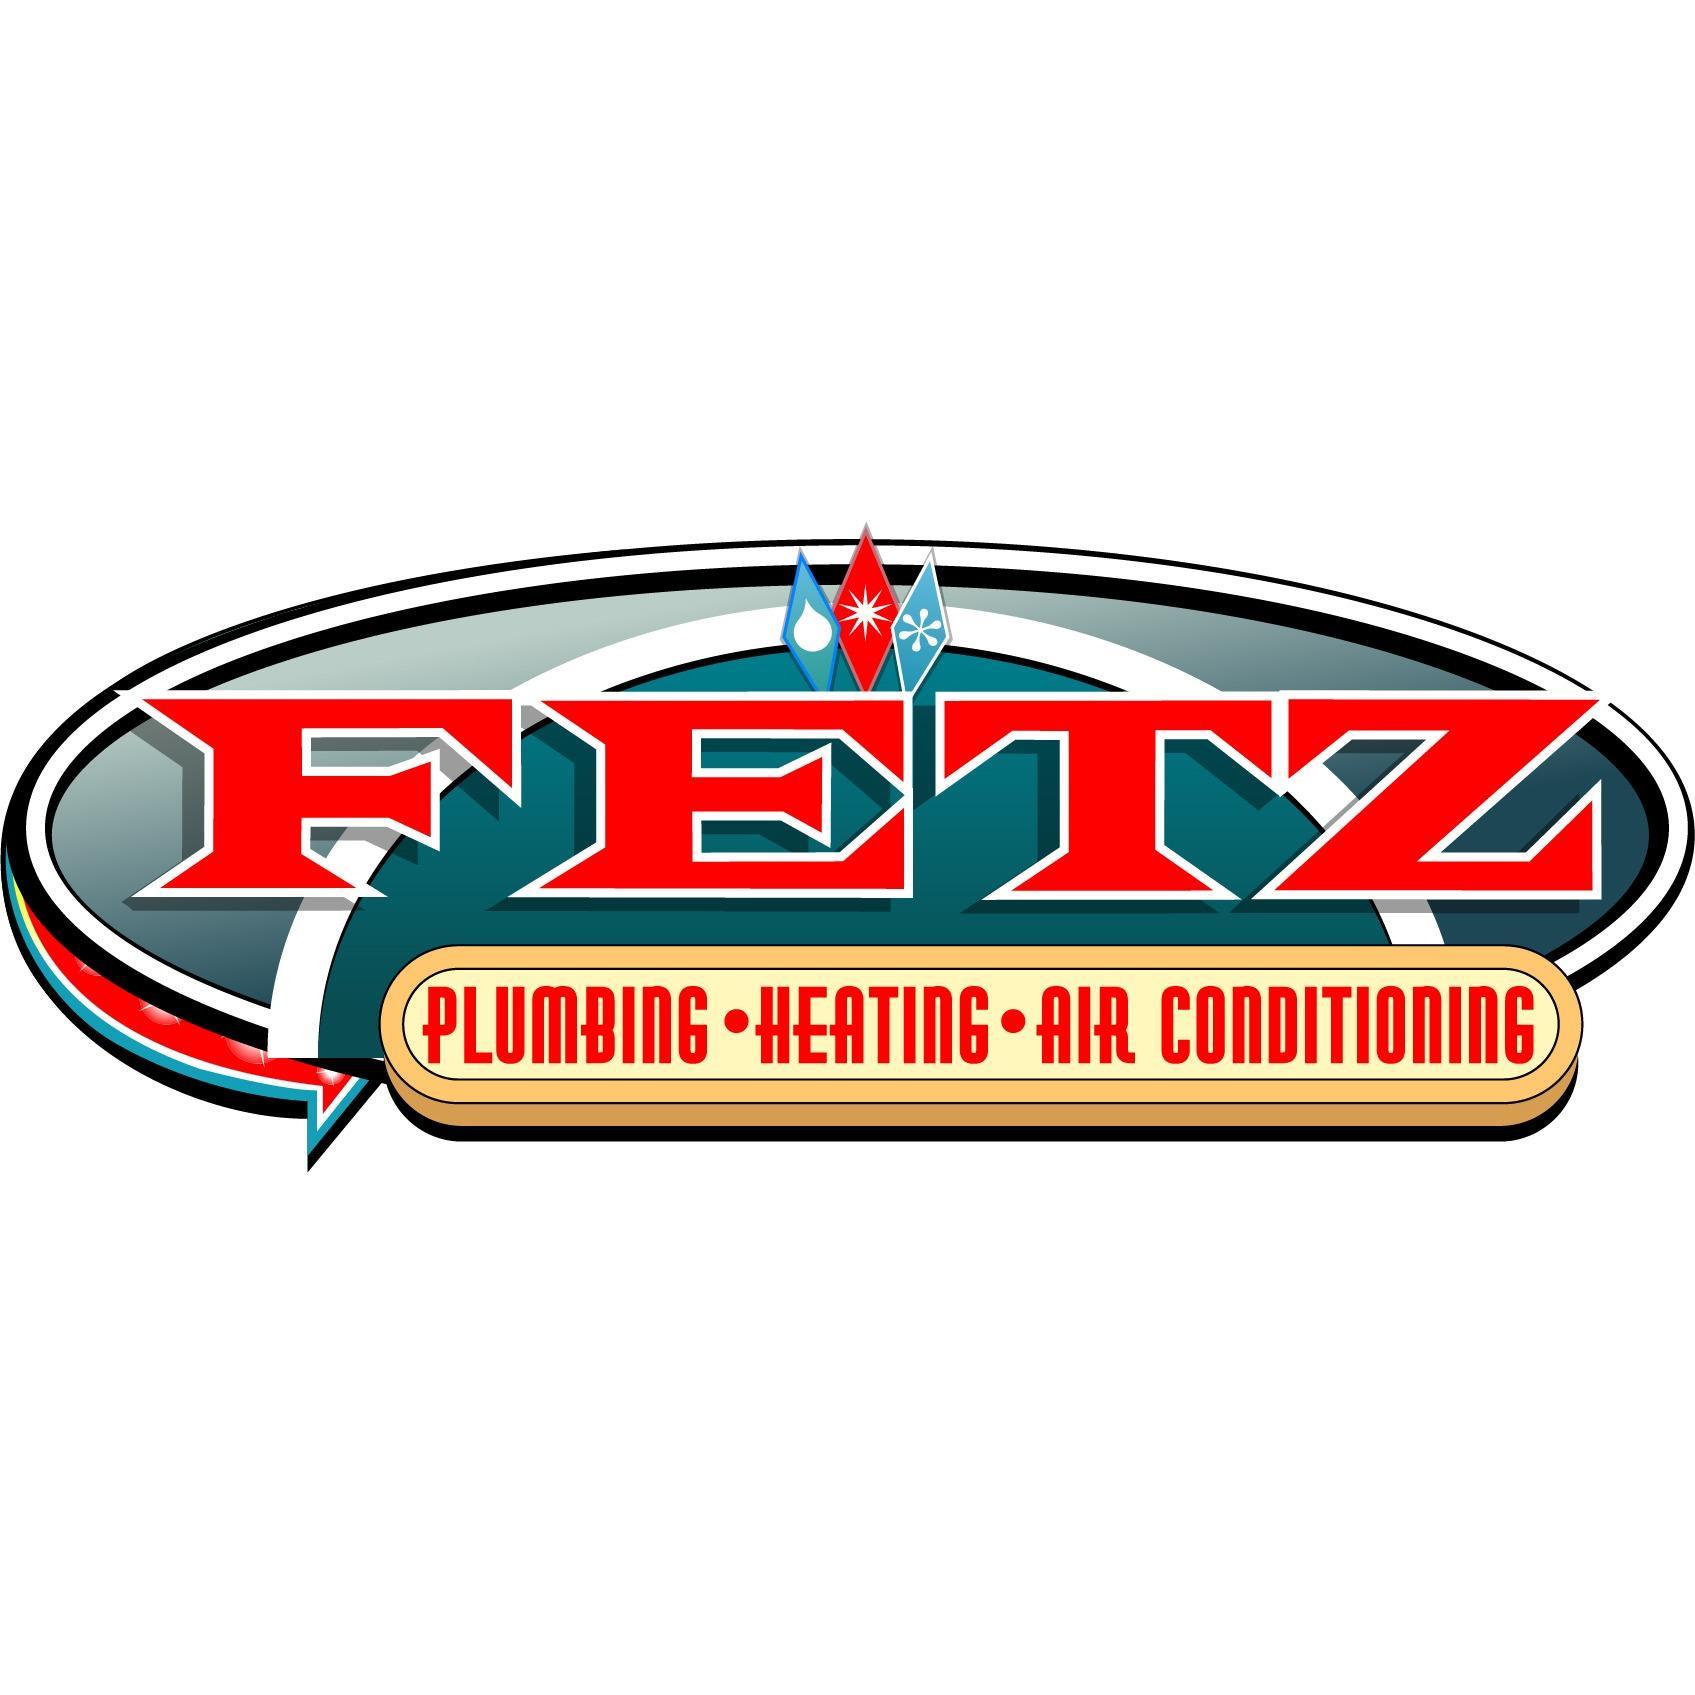 Fetz Plumbing Heating & Cooling